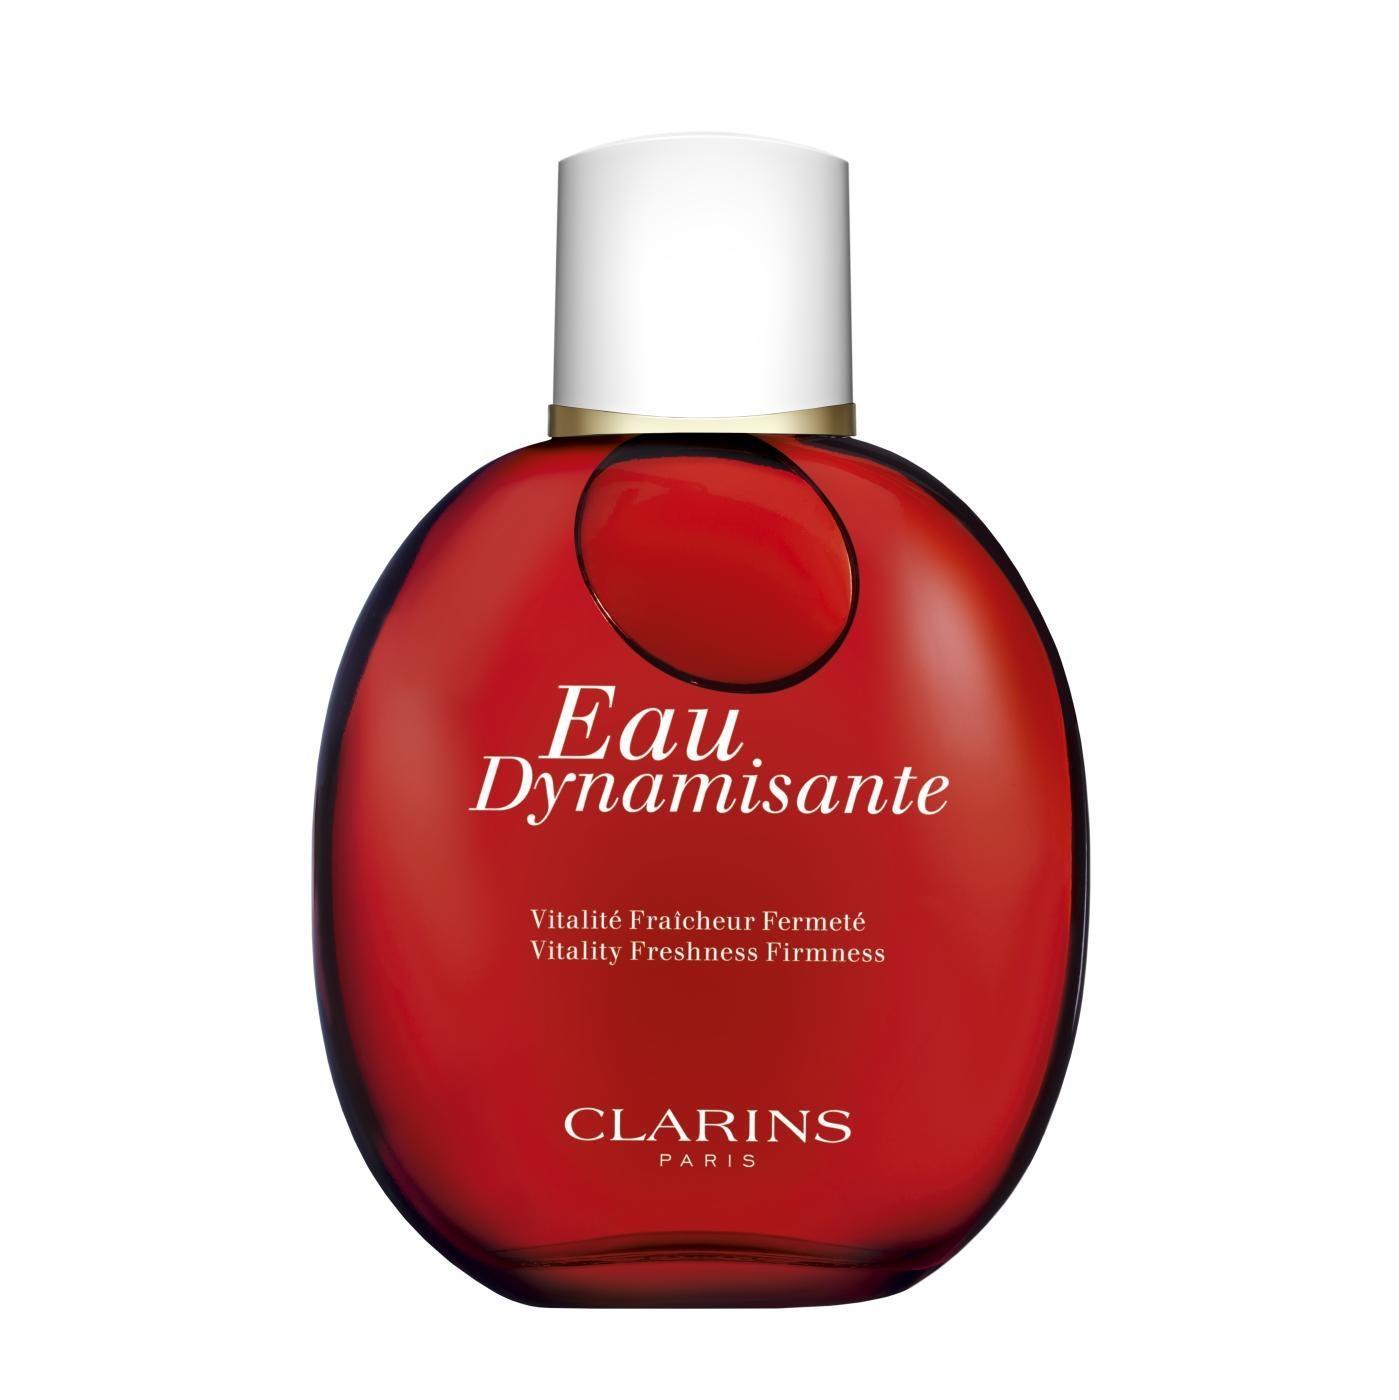 Acquista Eau Dynamisante Splash 200 Ml 17495984 | Glooke.com